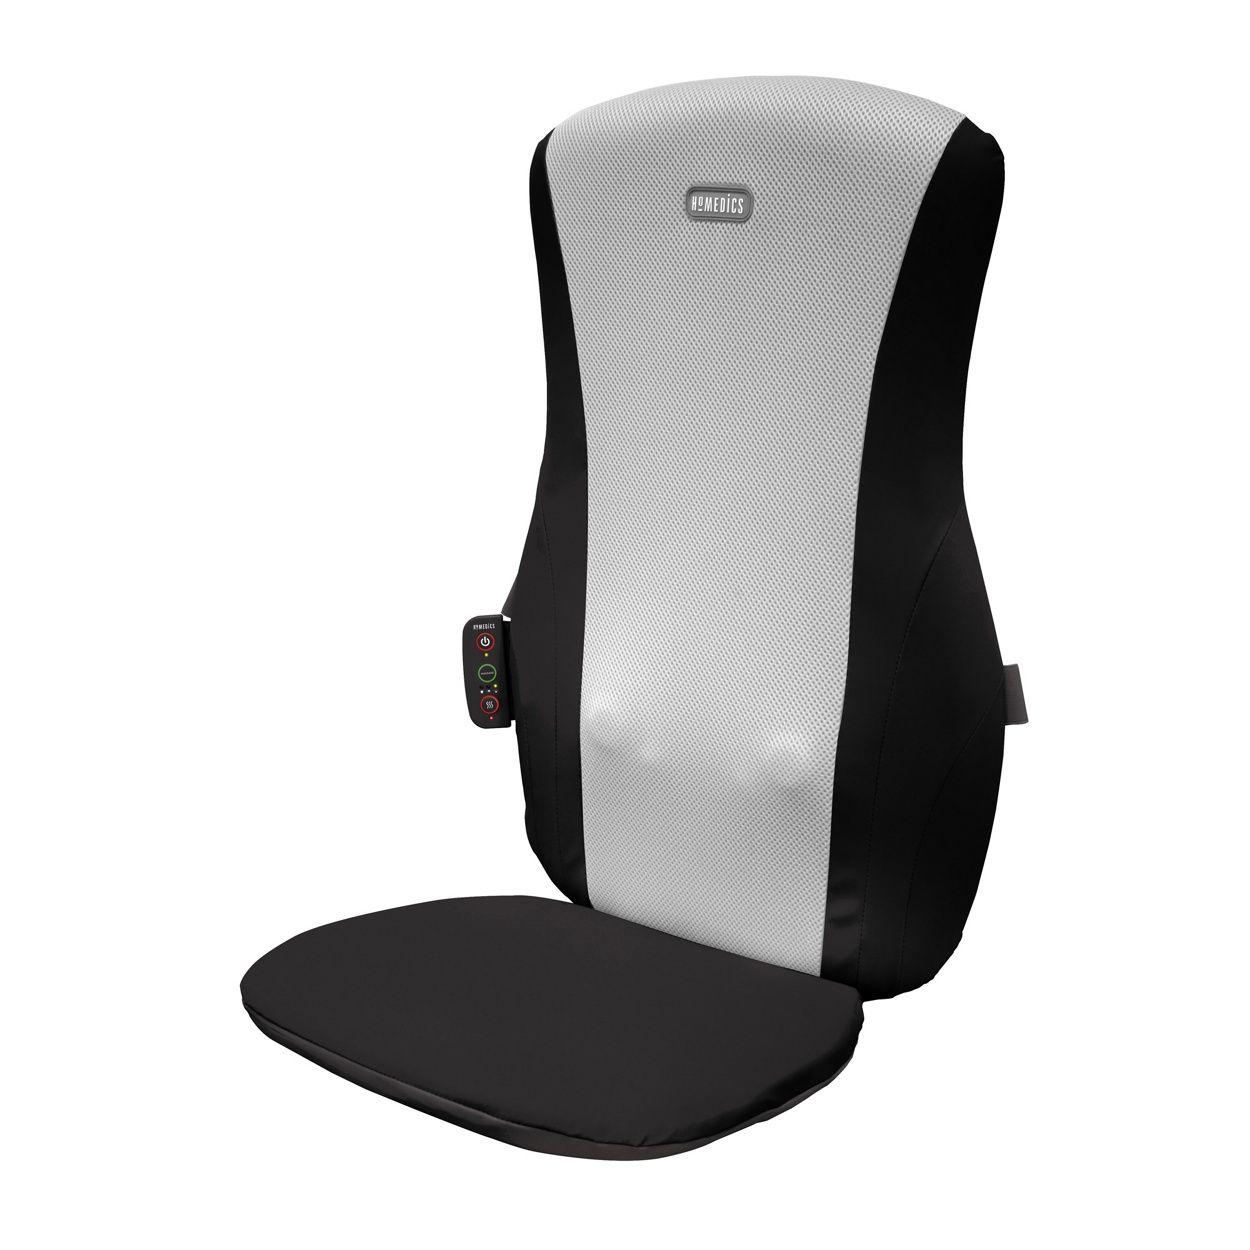 Homedics Full Back Shiatsu Massage Chair Sbm 189h At Debenhams Ie Shiatsu Massage Chair Shiatsu Massage Deep Tissue Massage